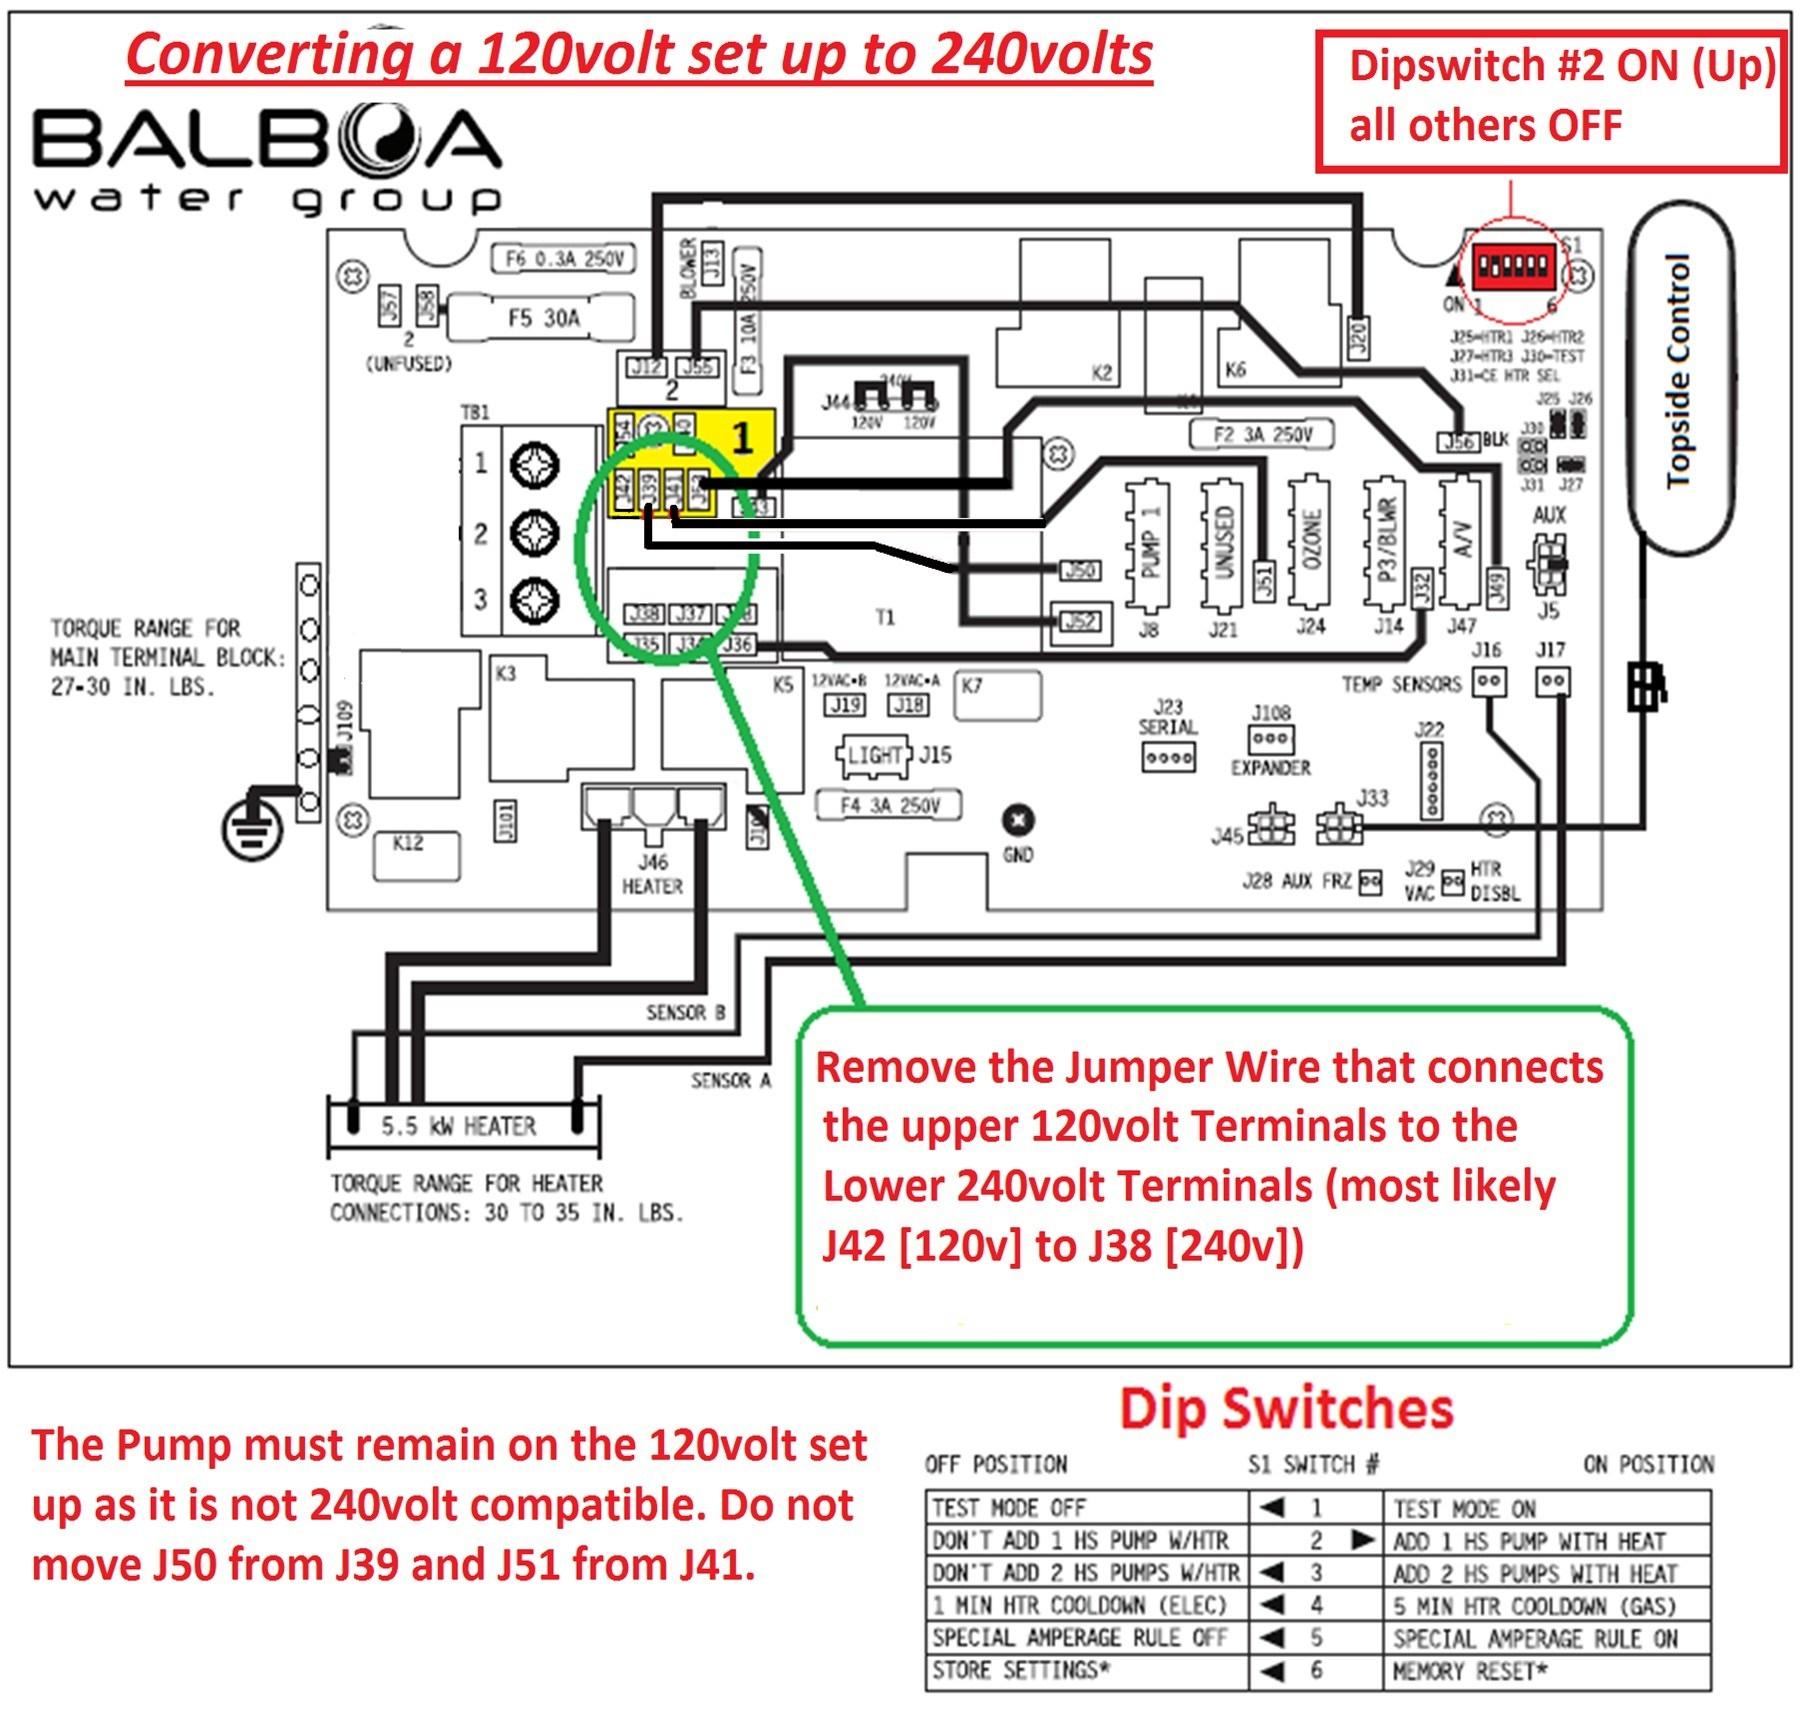 nordic hot tub wiring diagram Download-wiring diagram hot tub free wiring diagram xwiaw hot tub rh xwiaw us Hot Tub GFCI Wiring Hot Tub GFCI Wiring Diagram 8-i